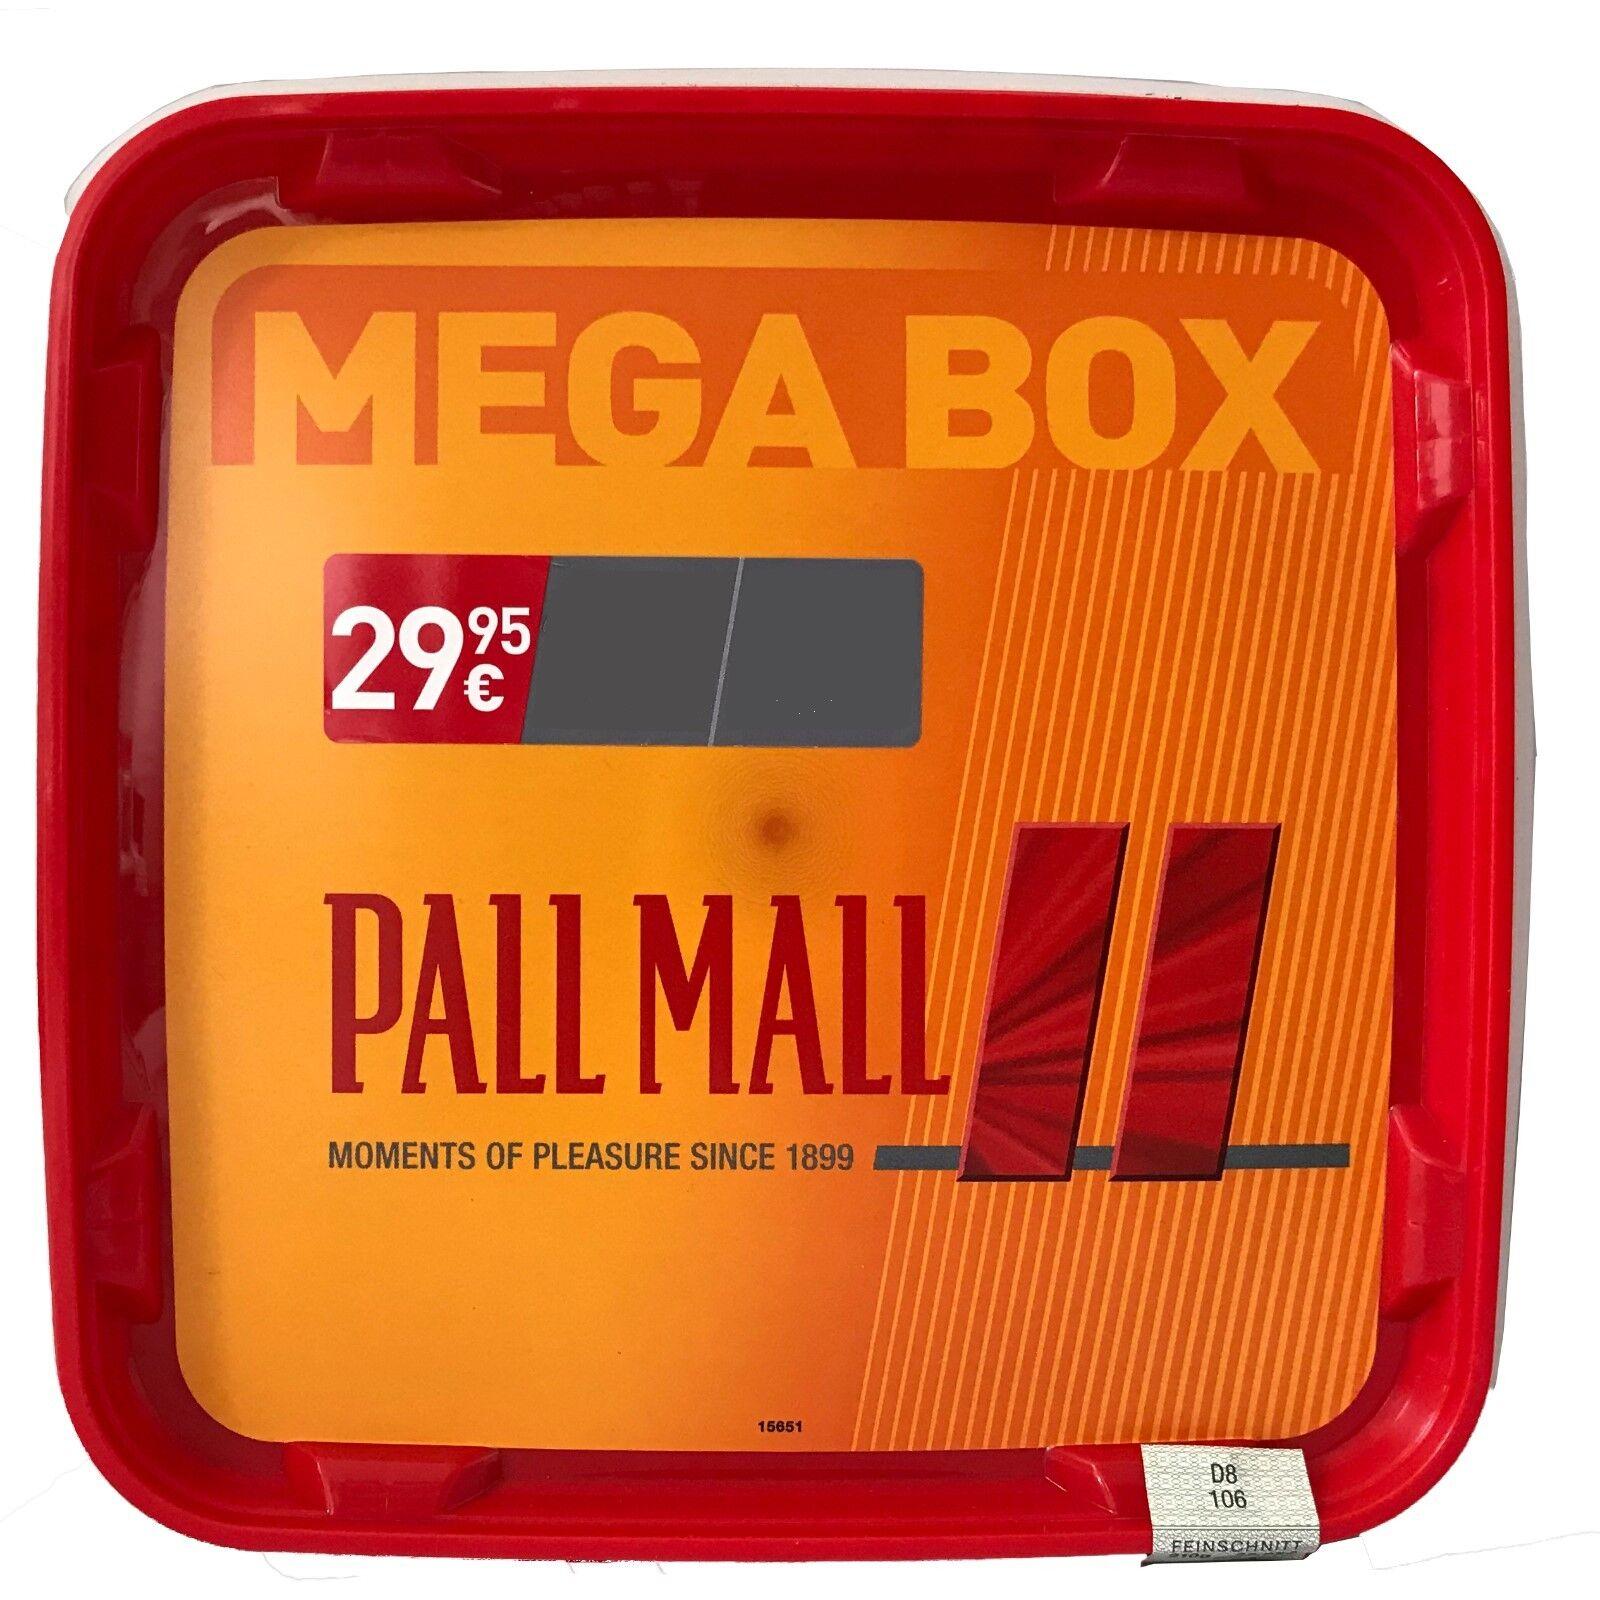 4 Pall Mall Volumentabak Mega Box 210g, Authentic Xtra Hülsen, Zubehör